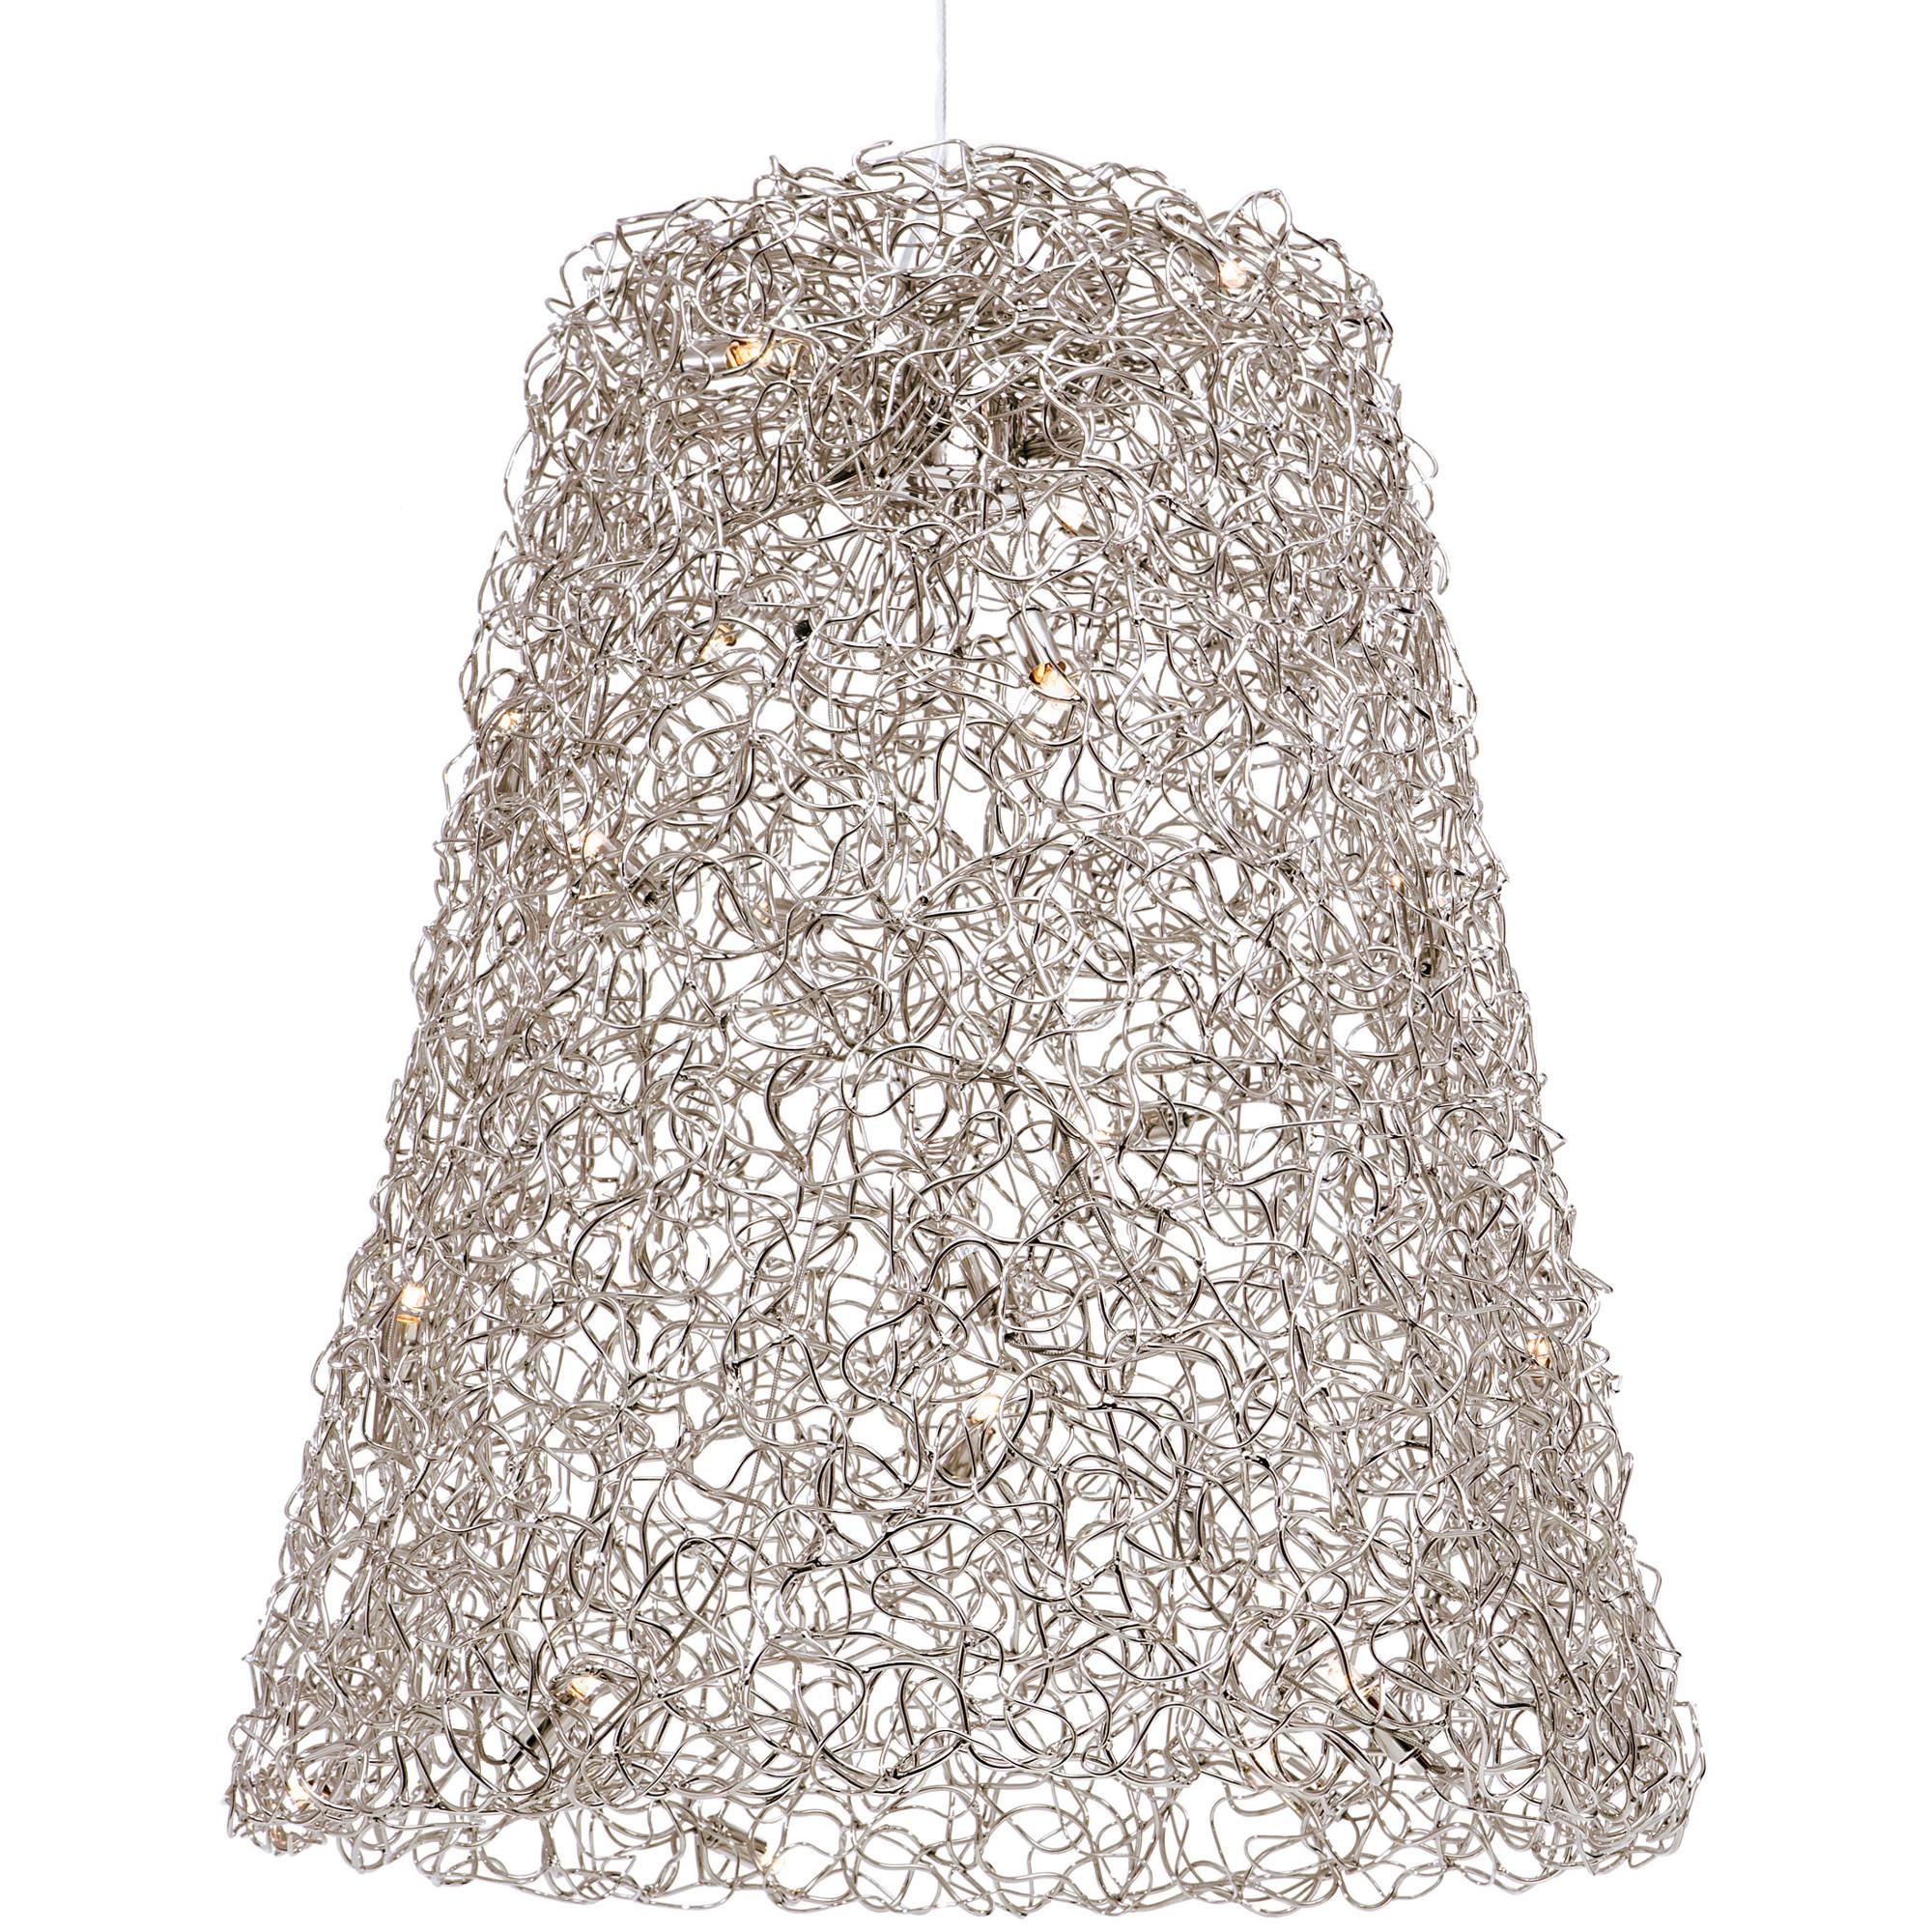 Crystal waters hanging lamp shade by brand van egmond cwshade60nhu aloadofball Image collections